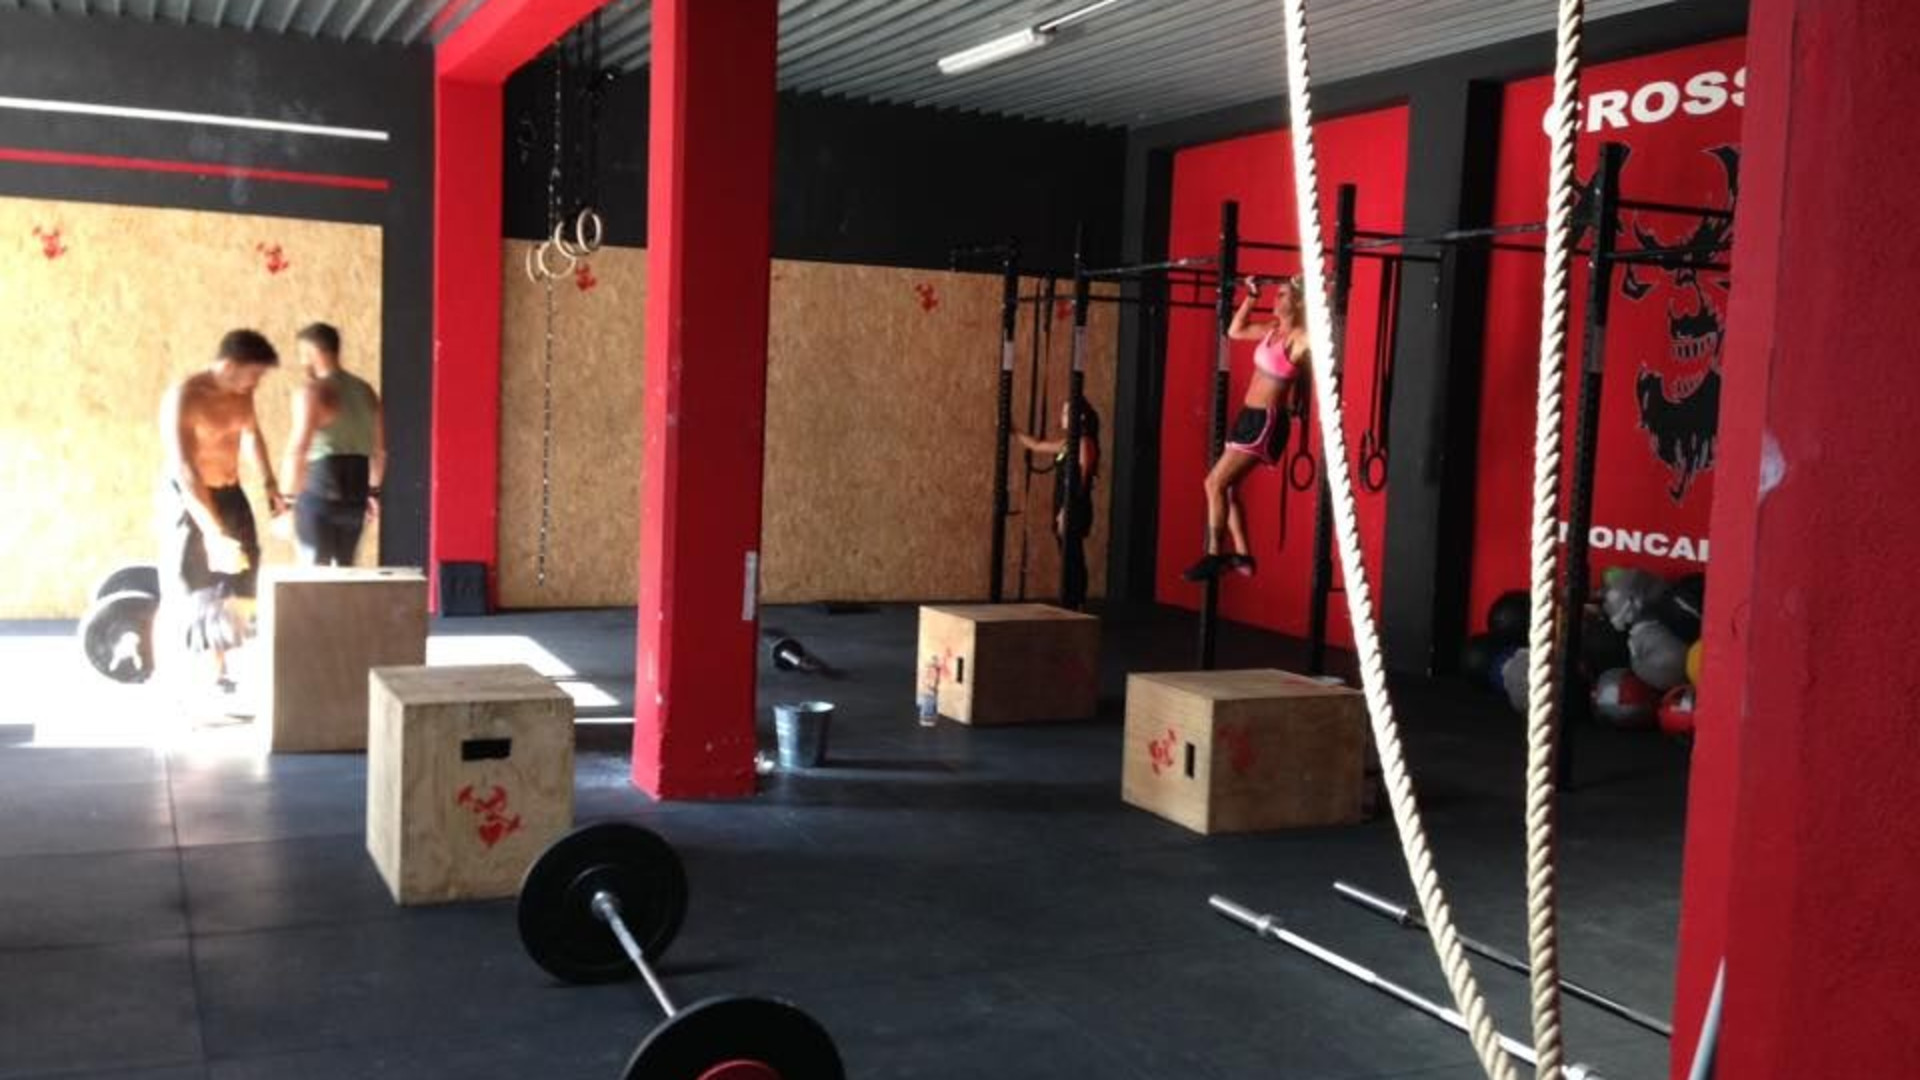 CrossFit Moncalieri